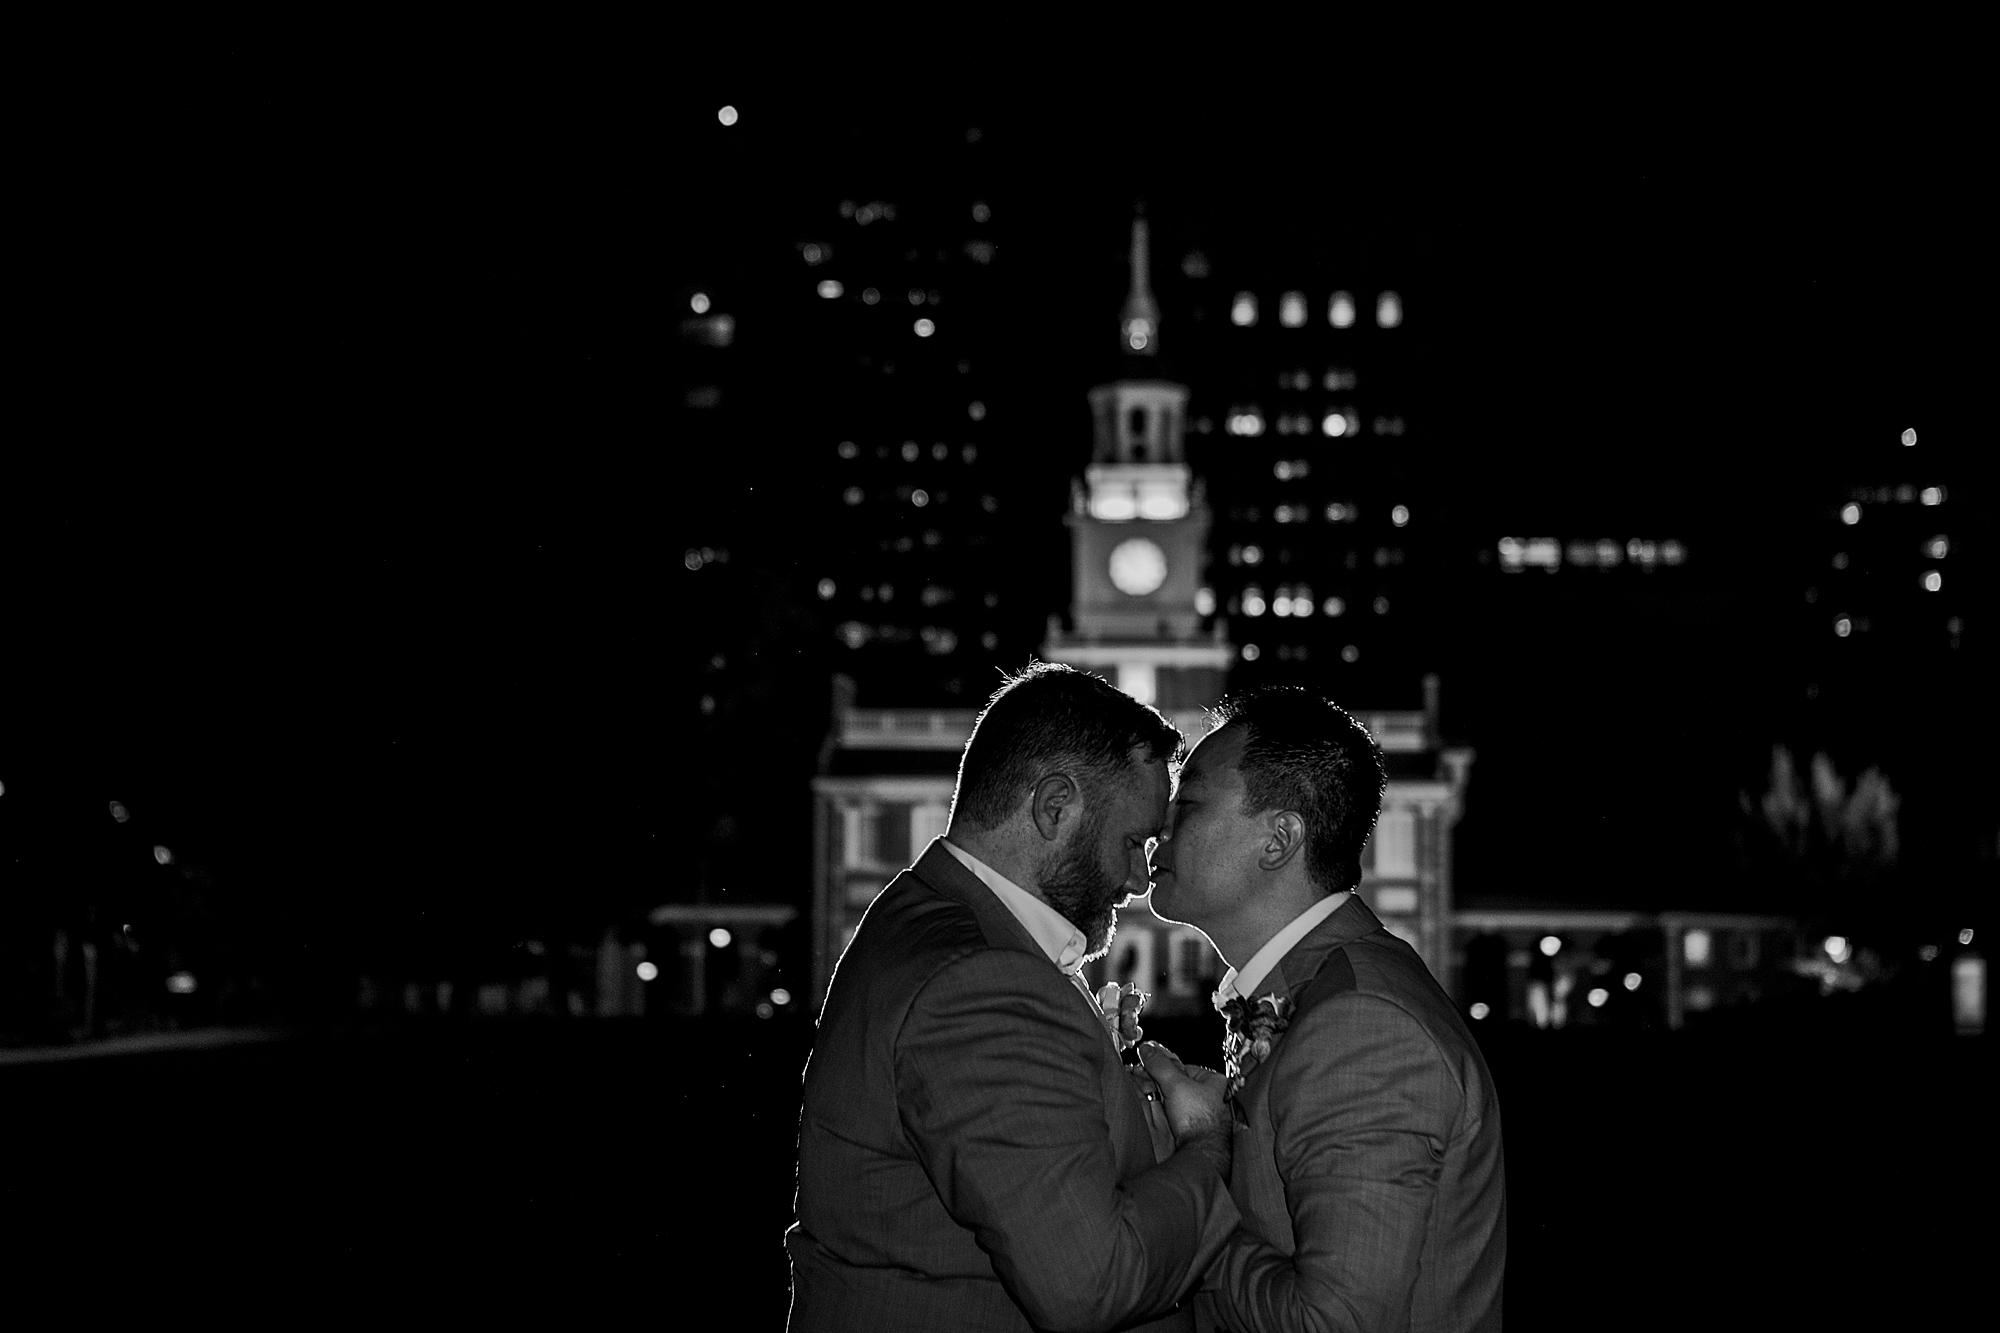 Dan_and_Byron_Love_by_Joe_Mac_Philadelphia_Wedding_LGBTQ_Photography_Gay_Independence_visitor_Center_151.JPG